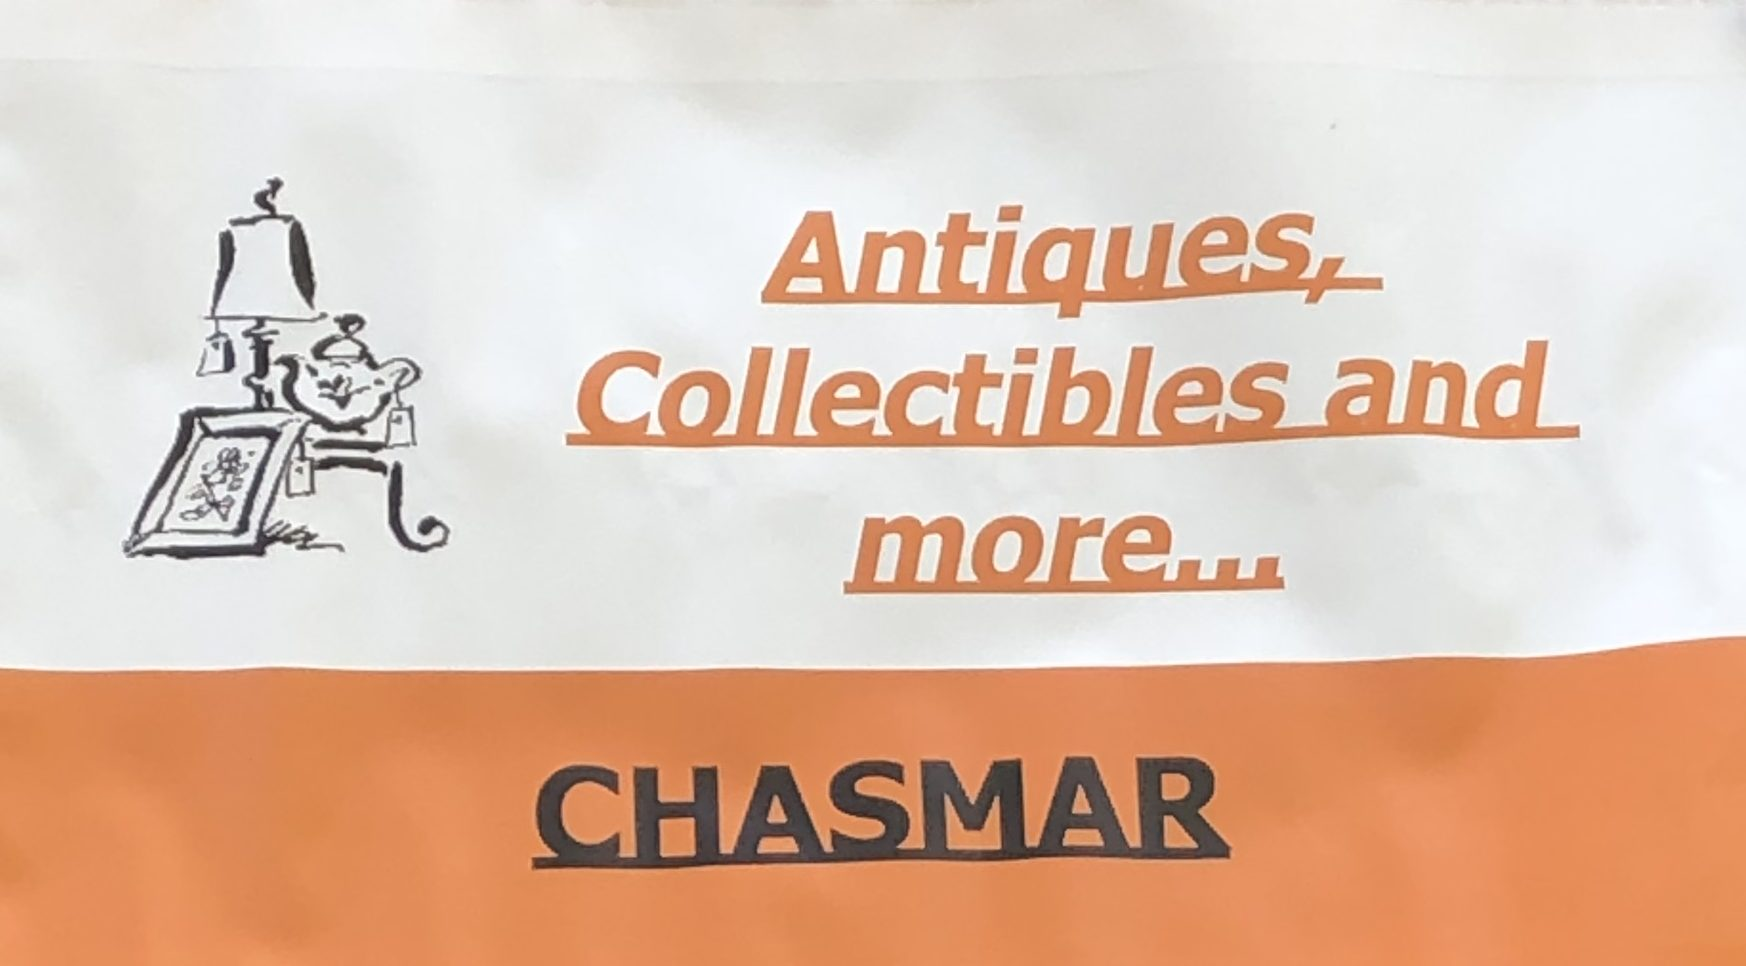 CHASMAR Antiques